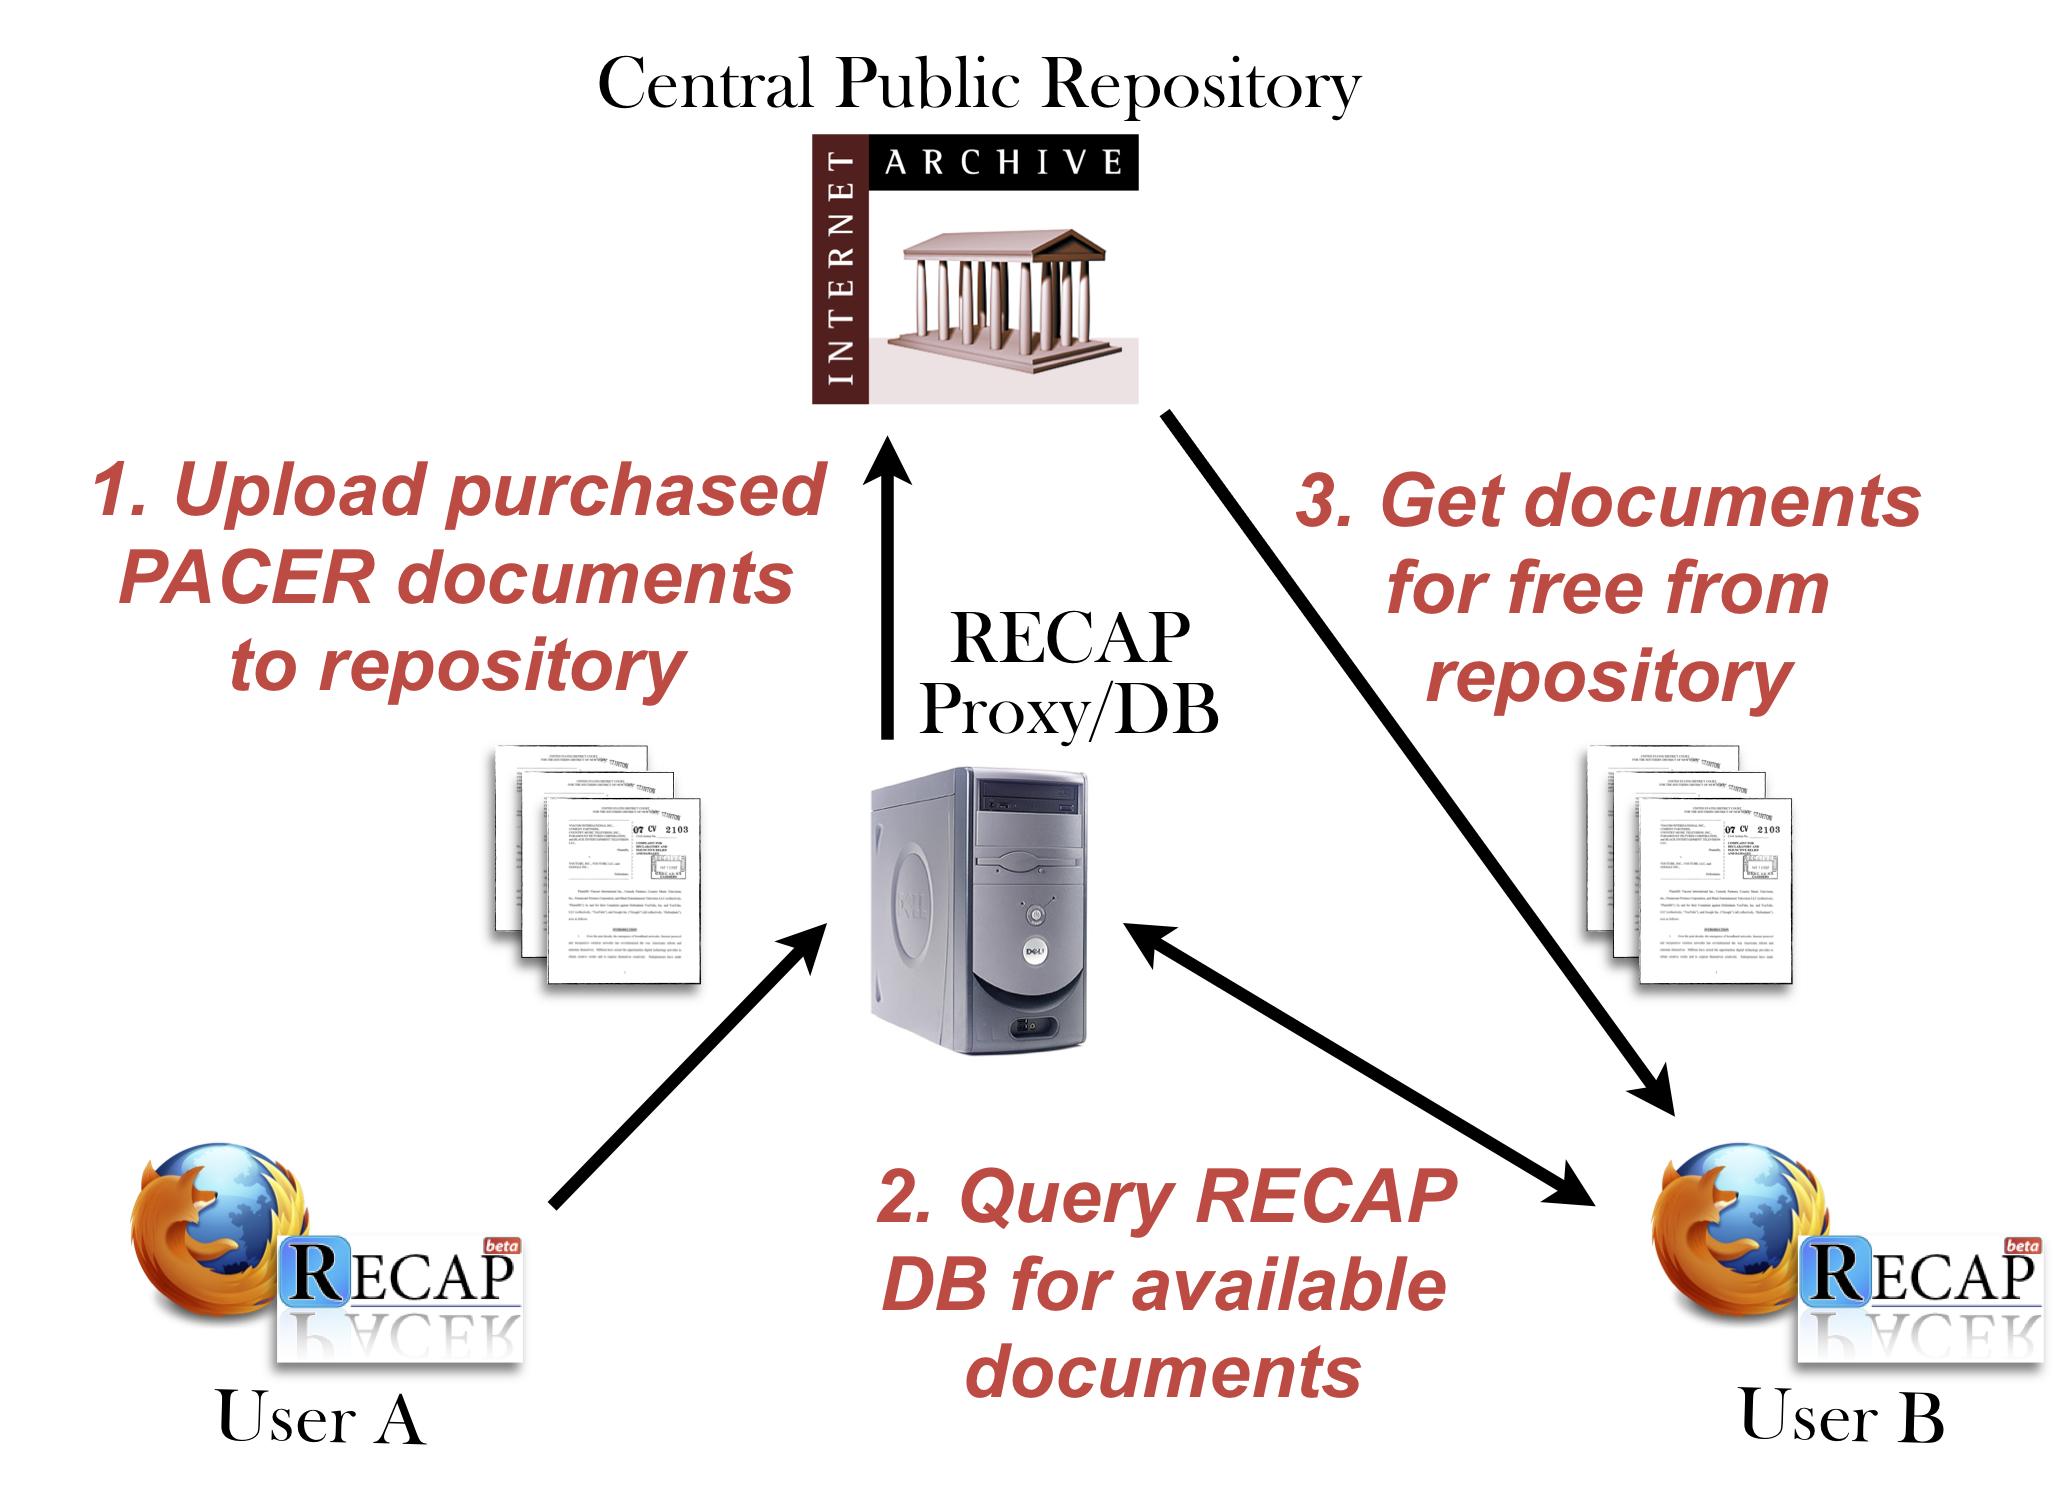 RECAP document sharing model